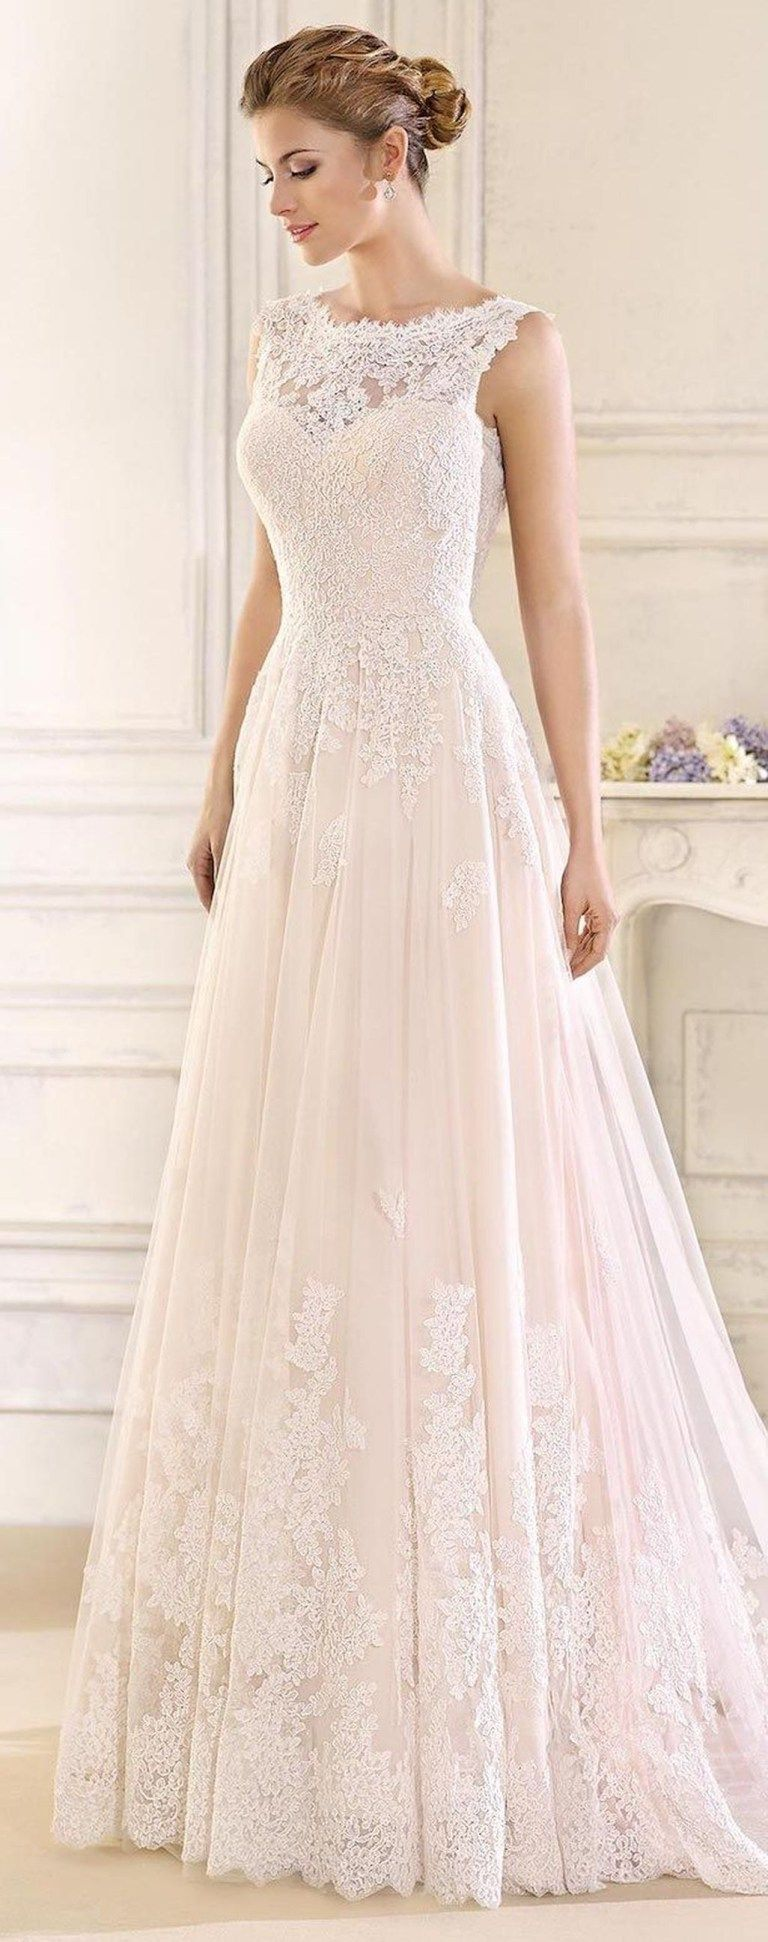 Elegant and vintage lace wedding dresses ideas weddings